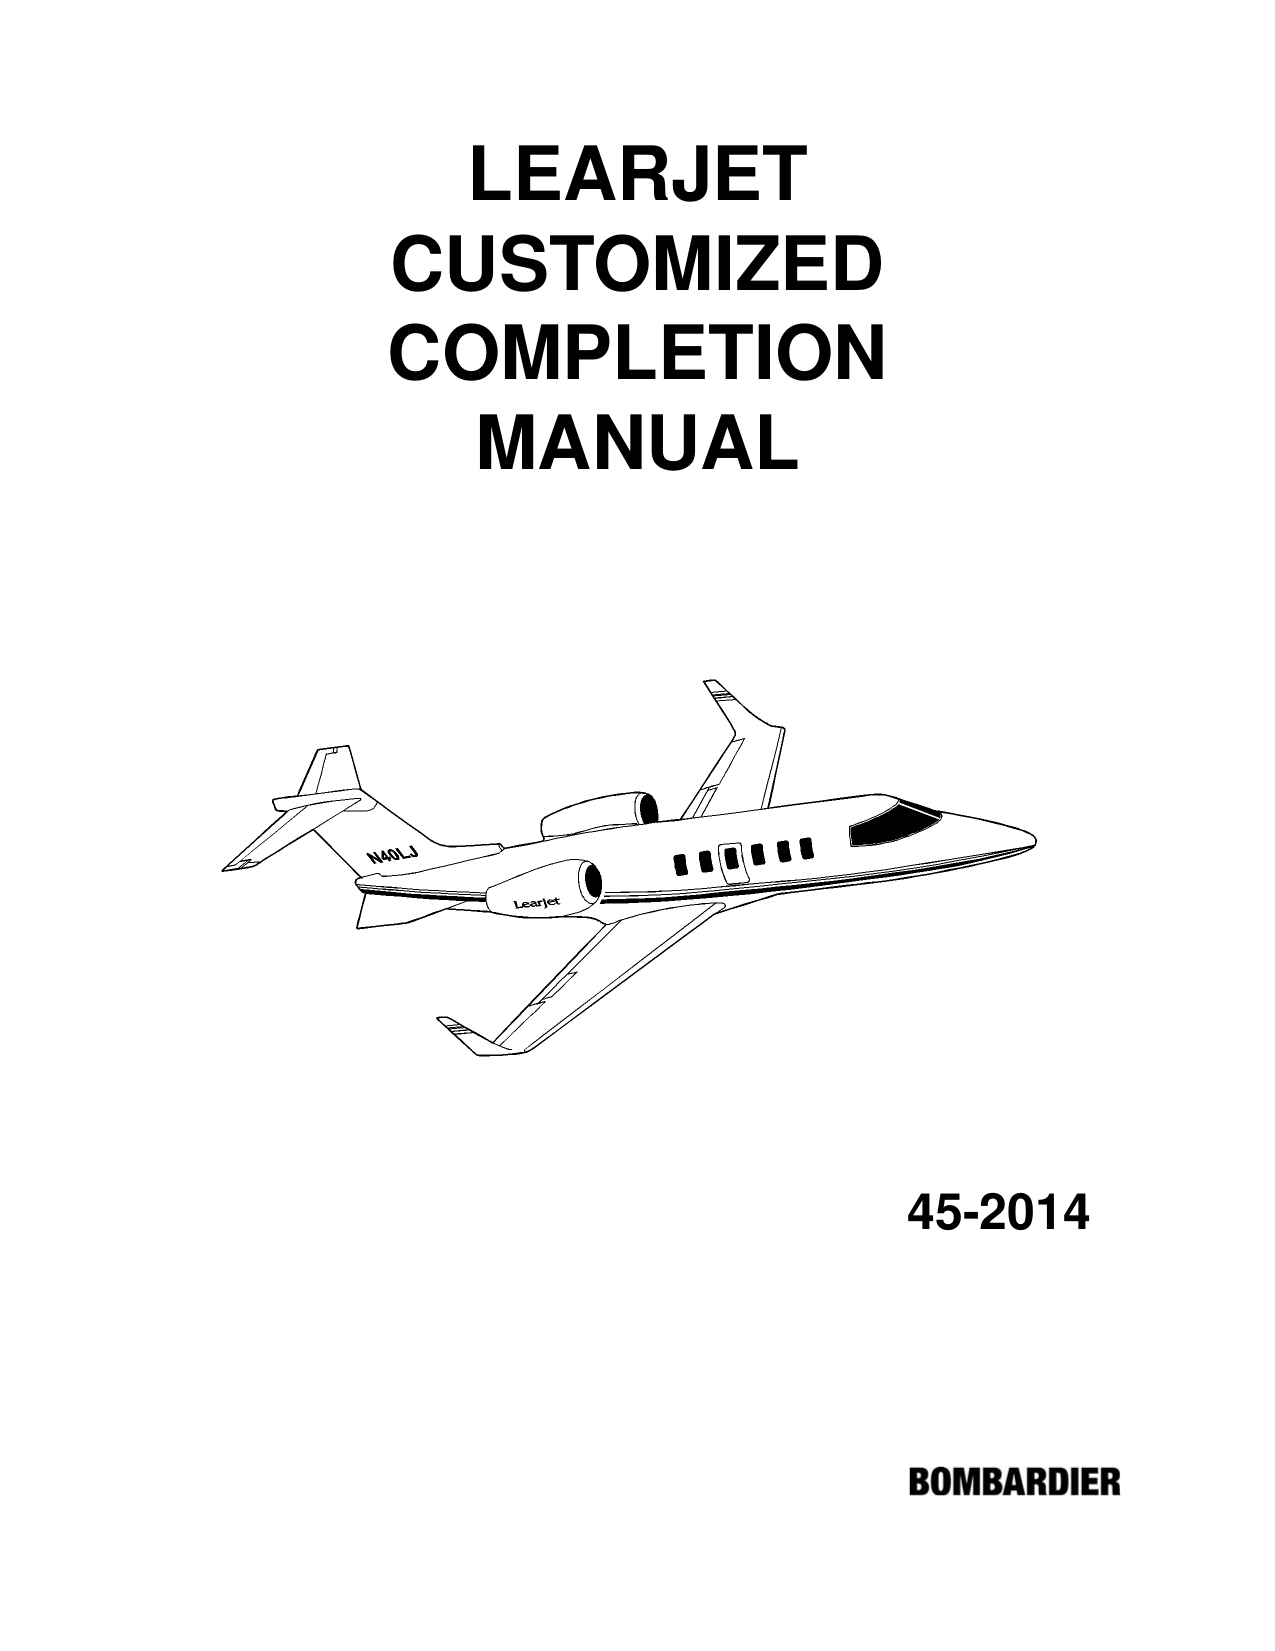 pdf for Telex Other LCU-3 Intercom System manual